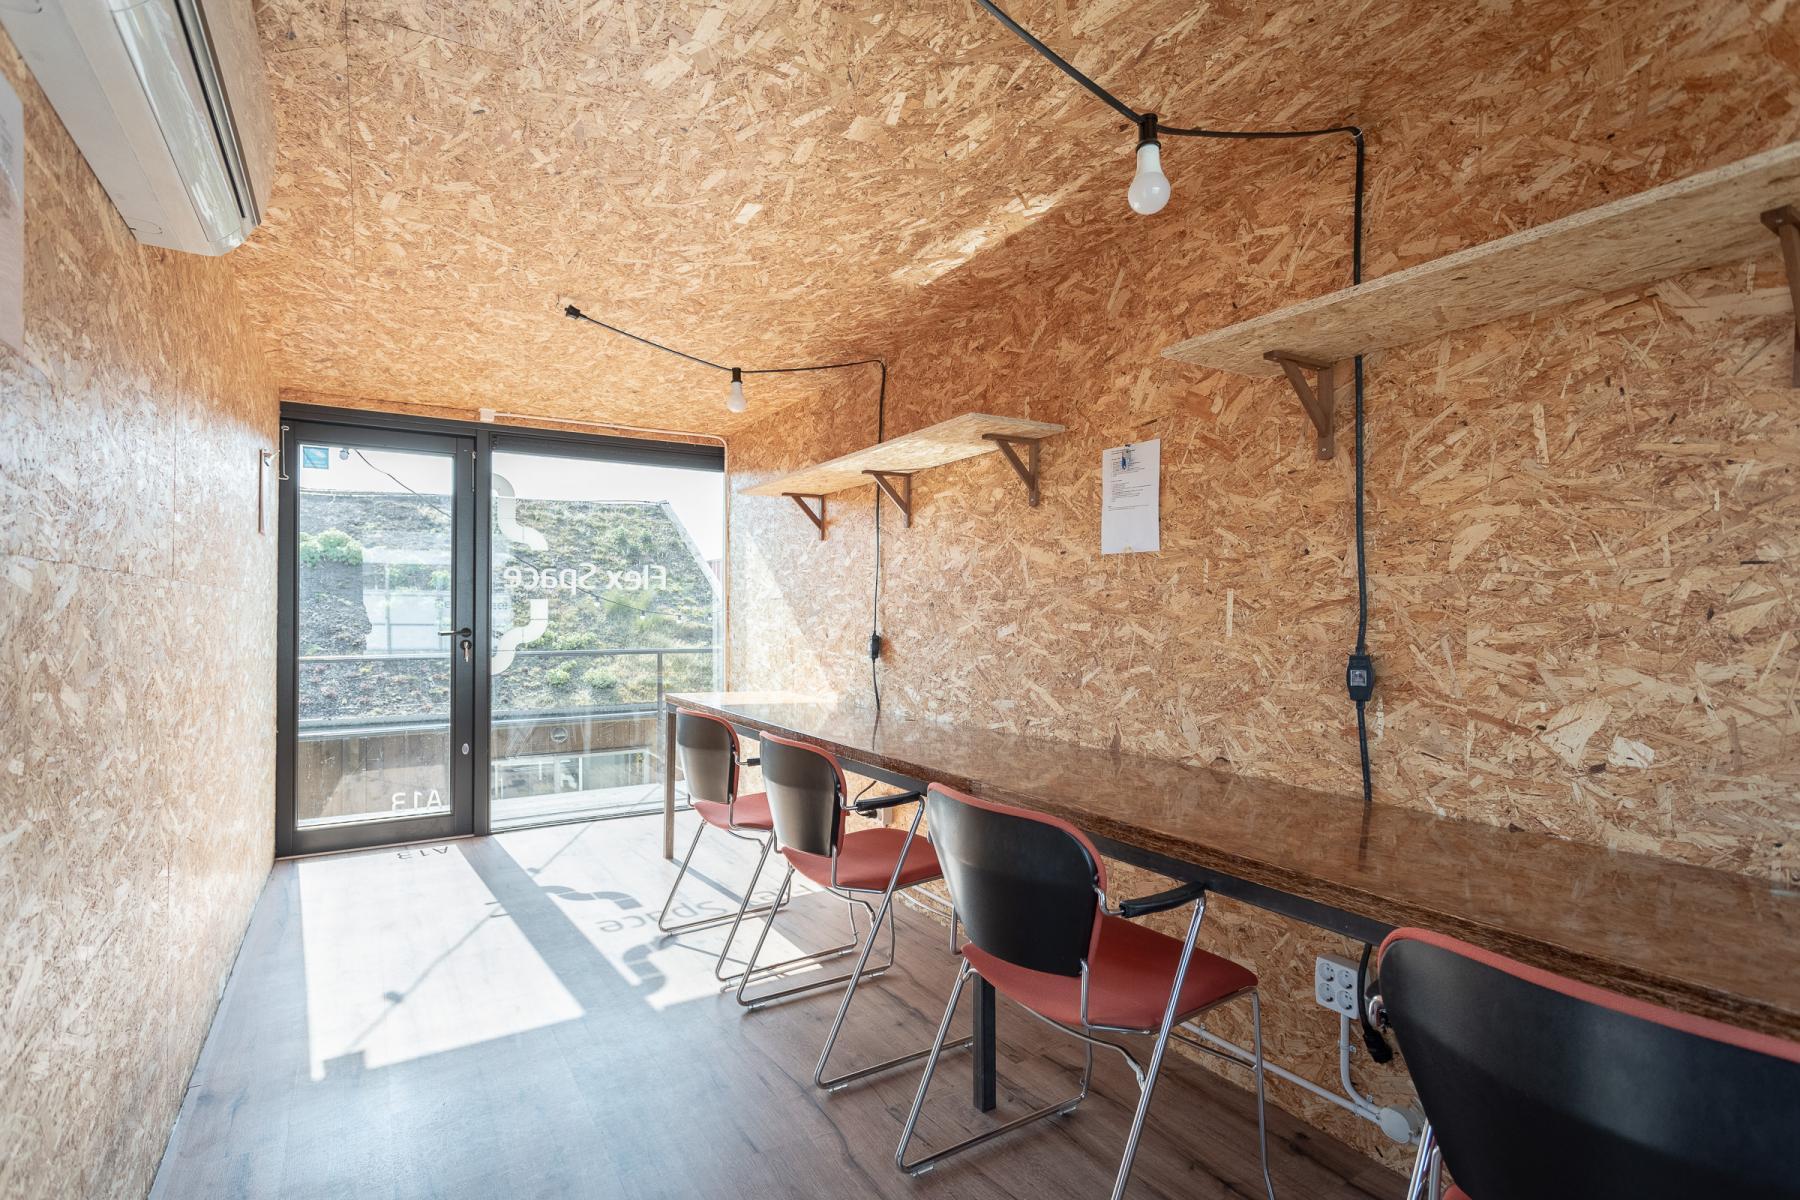 Containterpark creatieve werkplekken kantoorruimtes Amsterdam science park